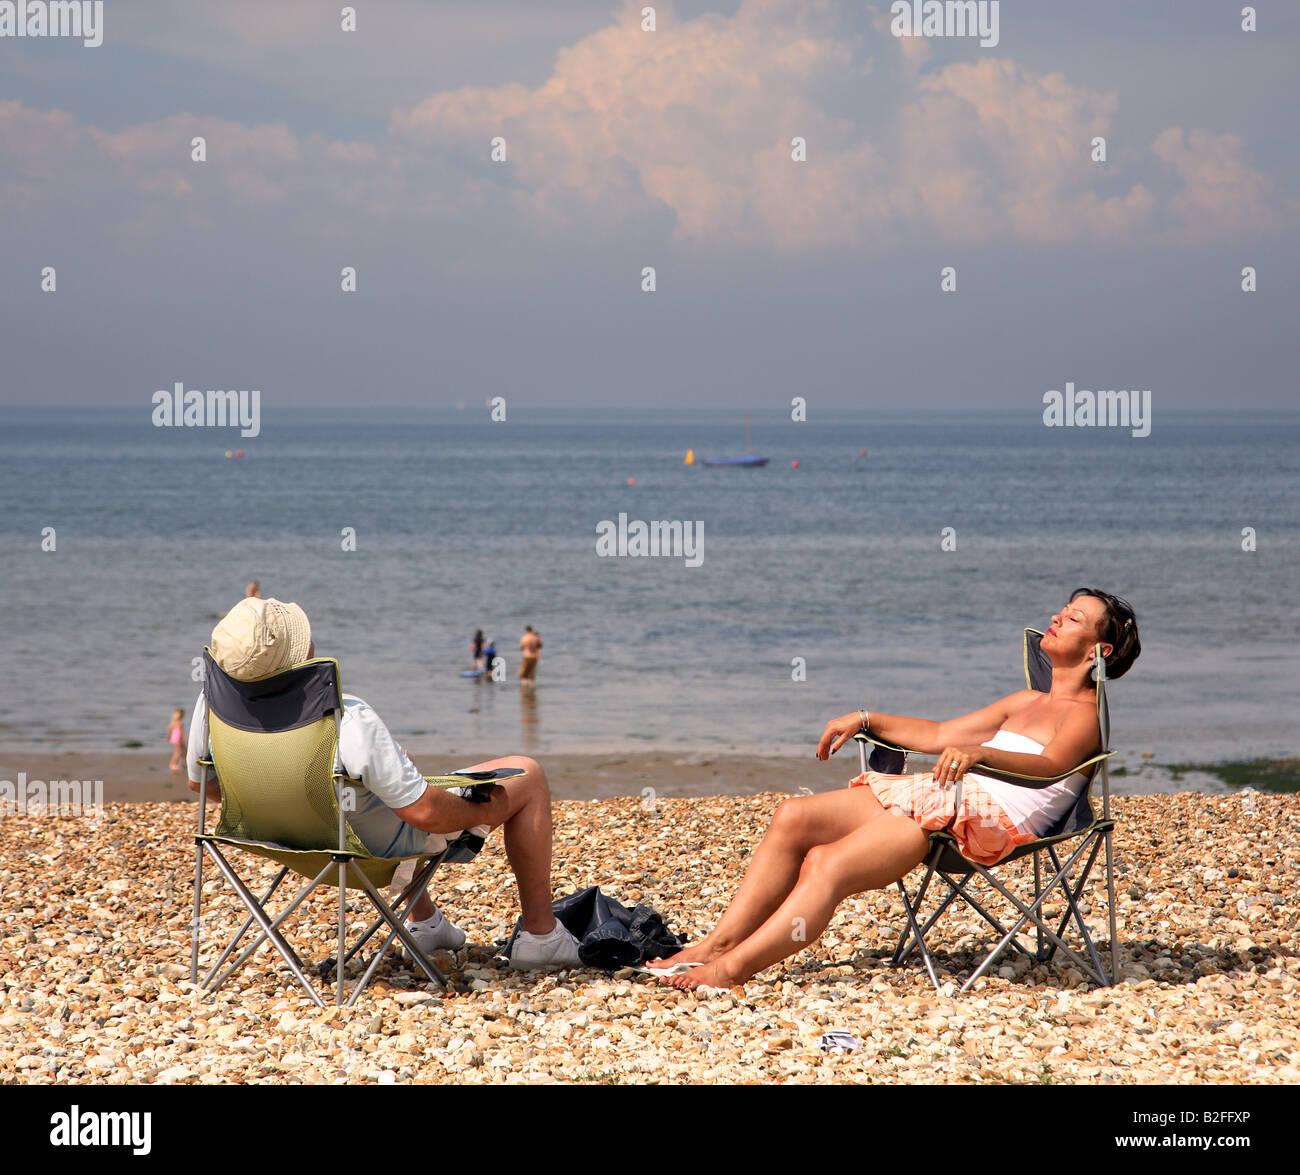 beach scene whitstable englan - Stock Image